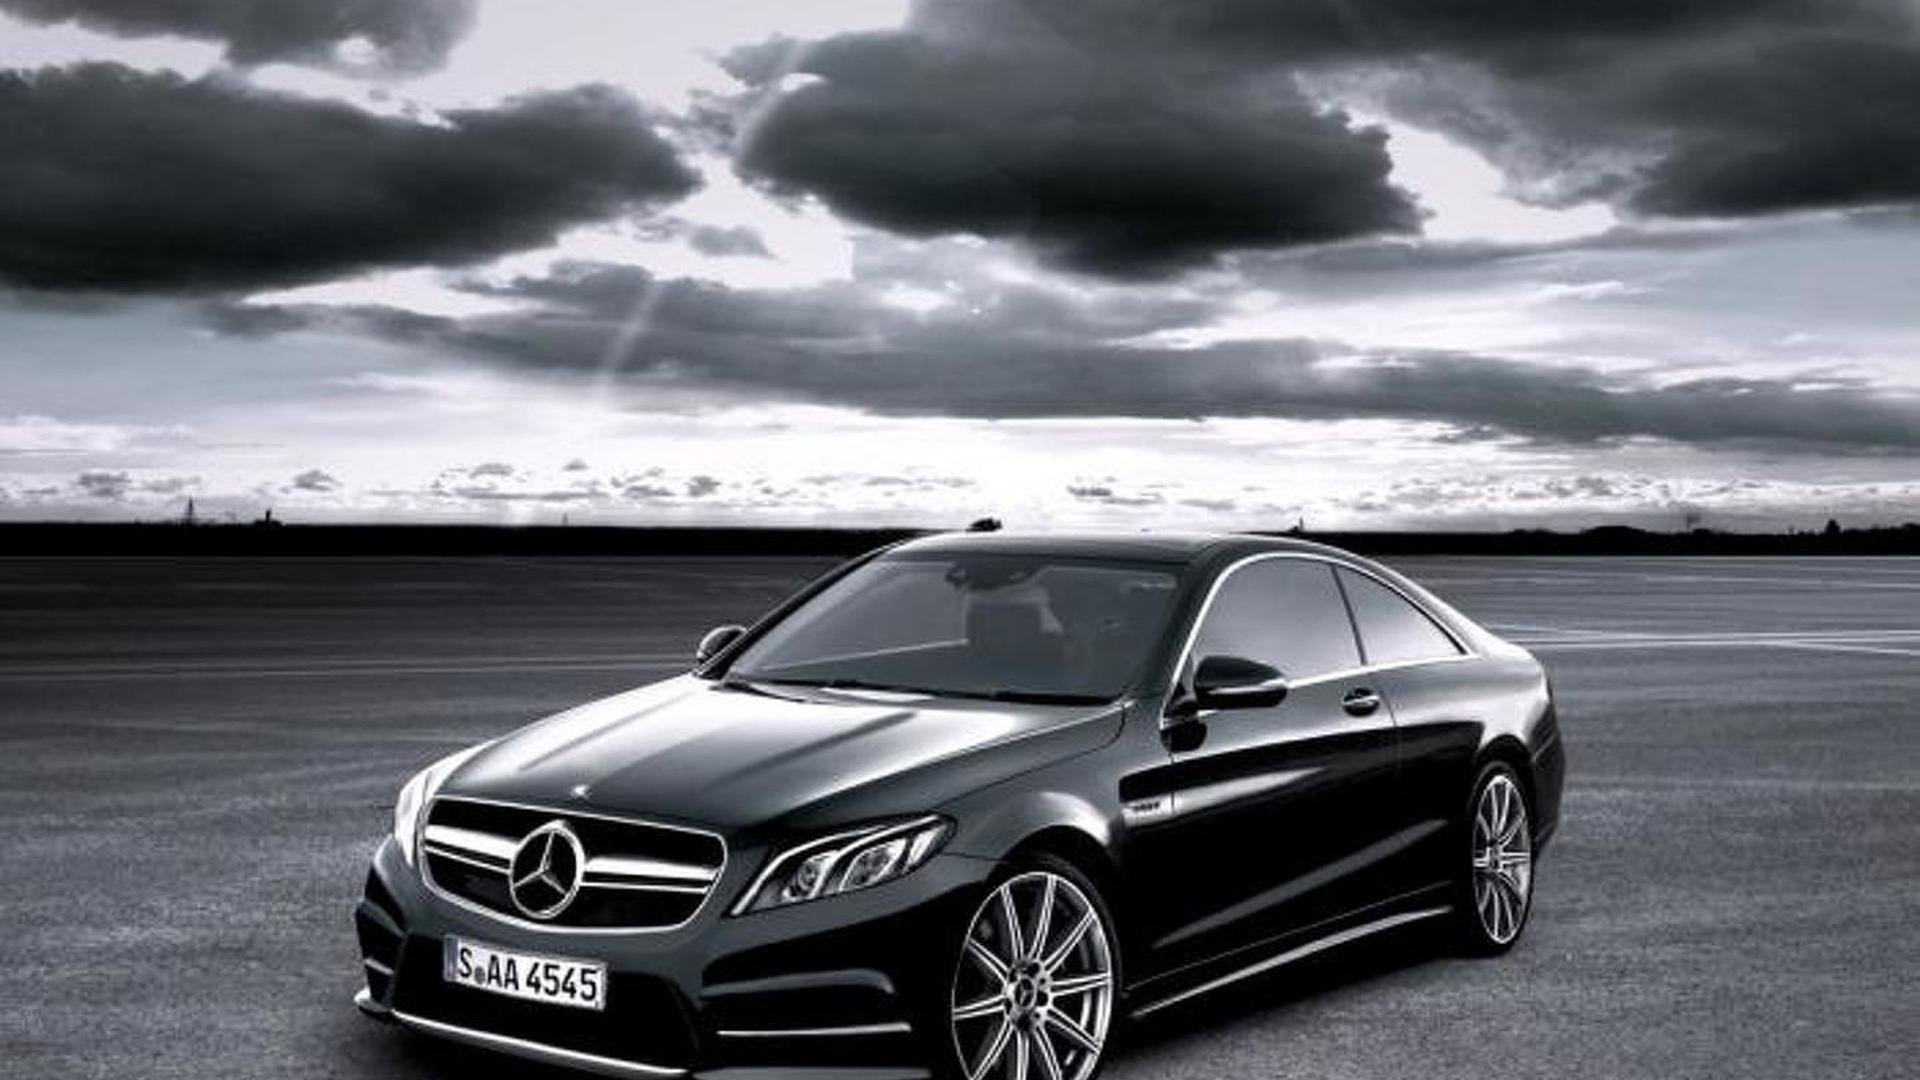 wcf reader envisions next gen mercedes benz e class coupe and convertible. Black Bedroom Furniture Sets. Home Design Ideas